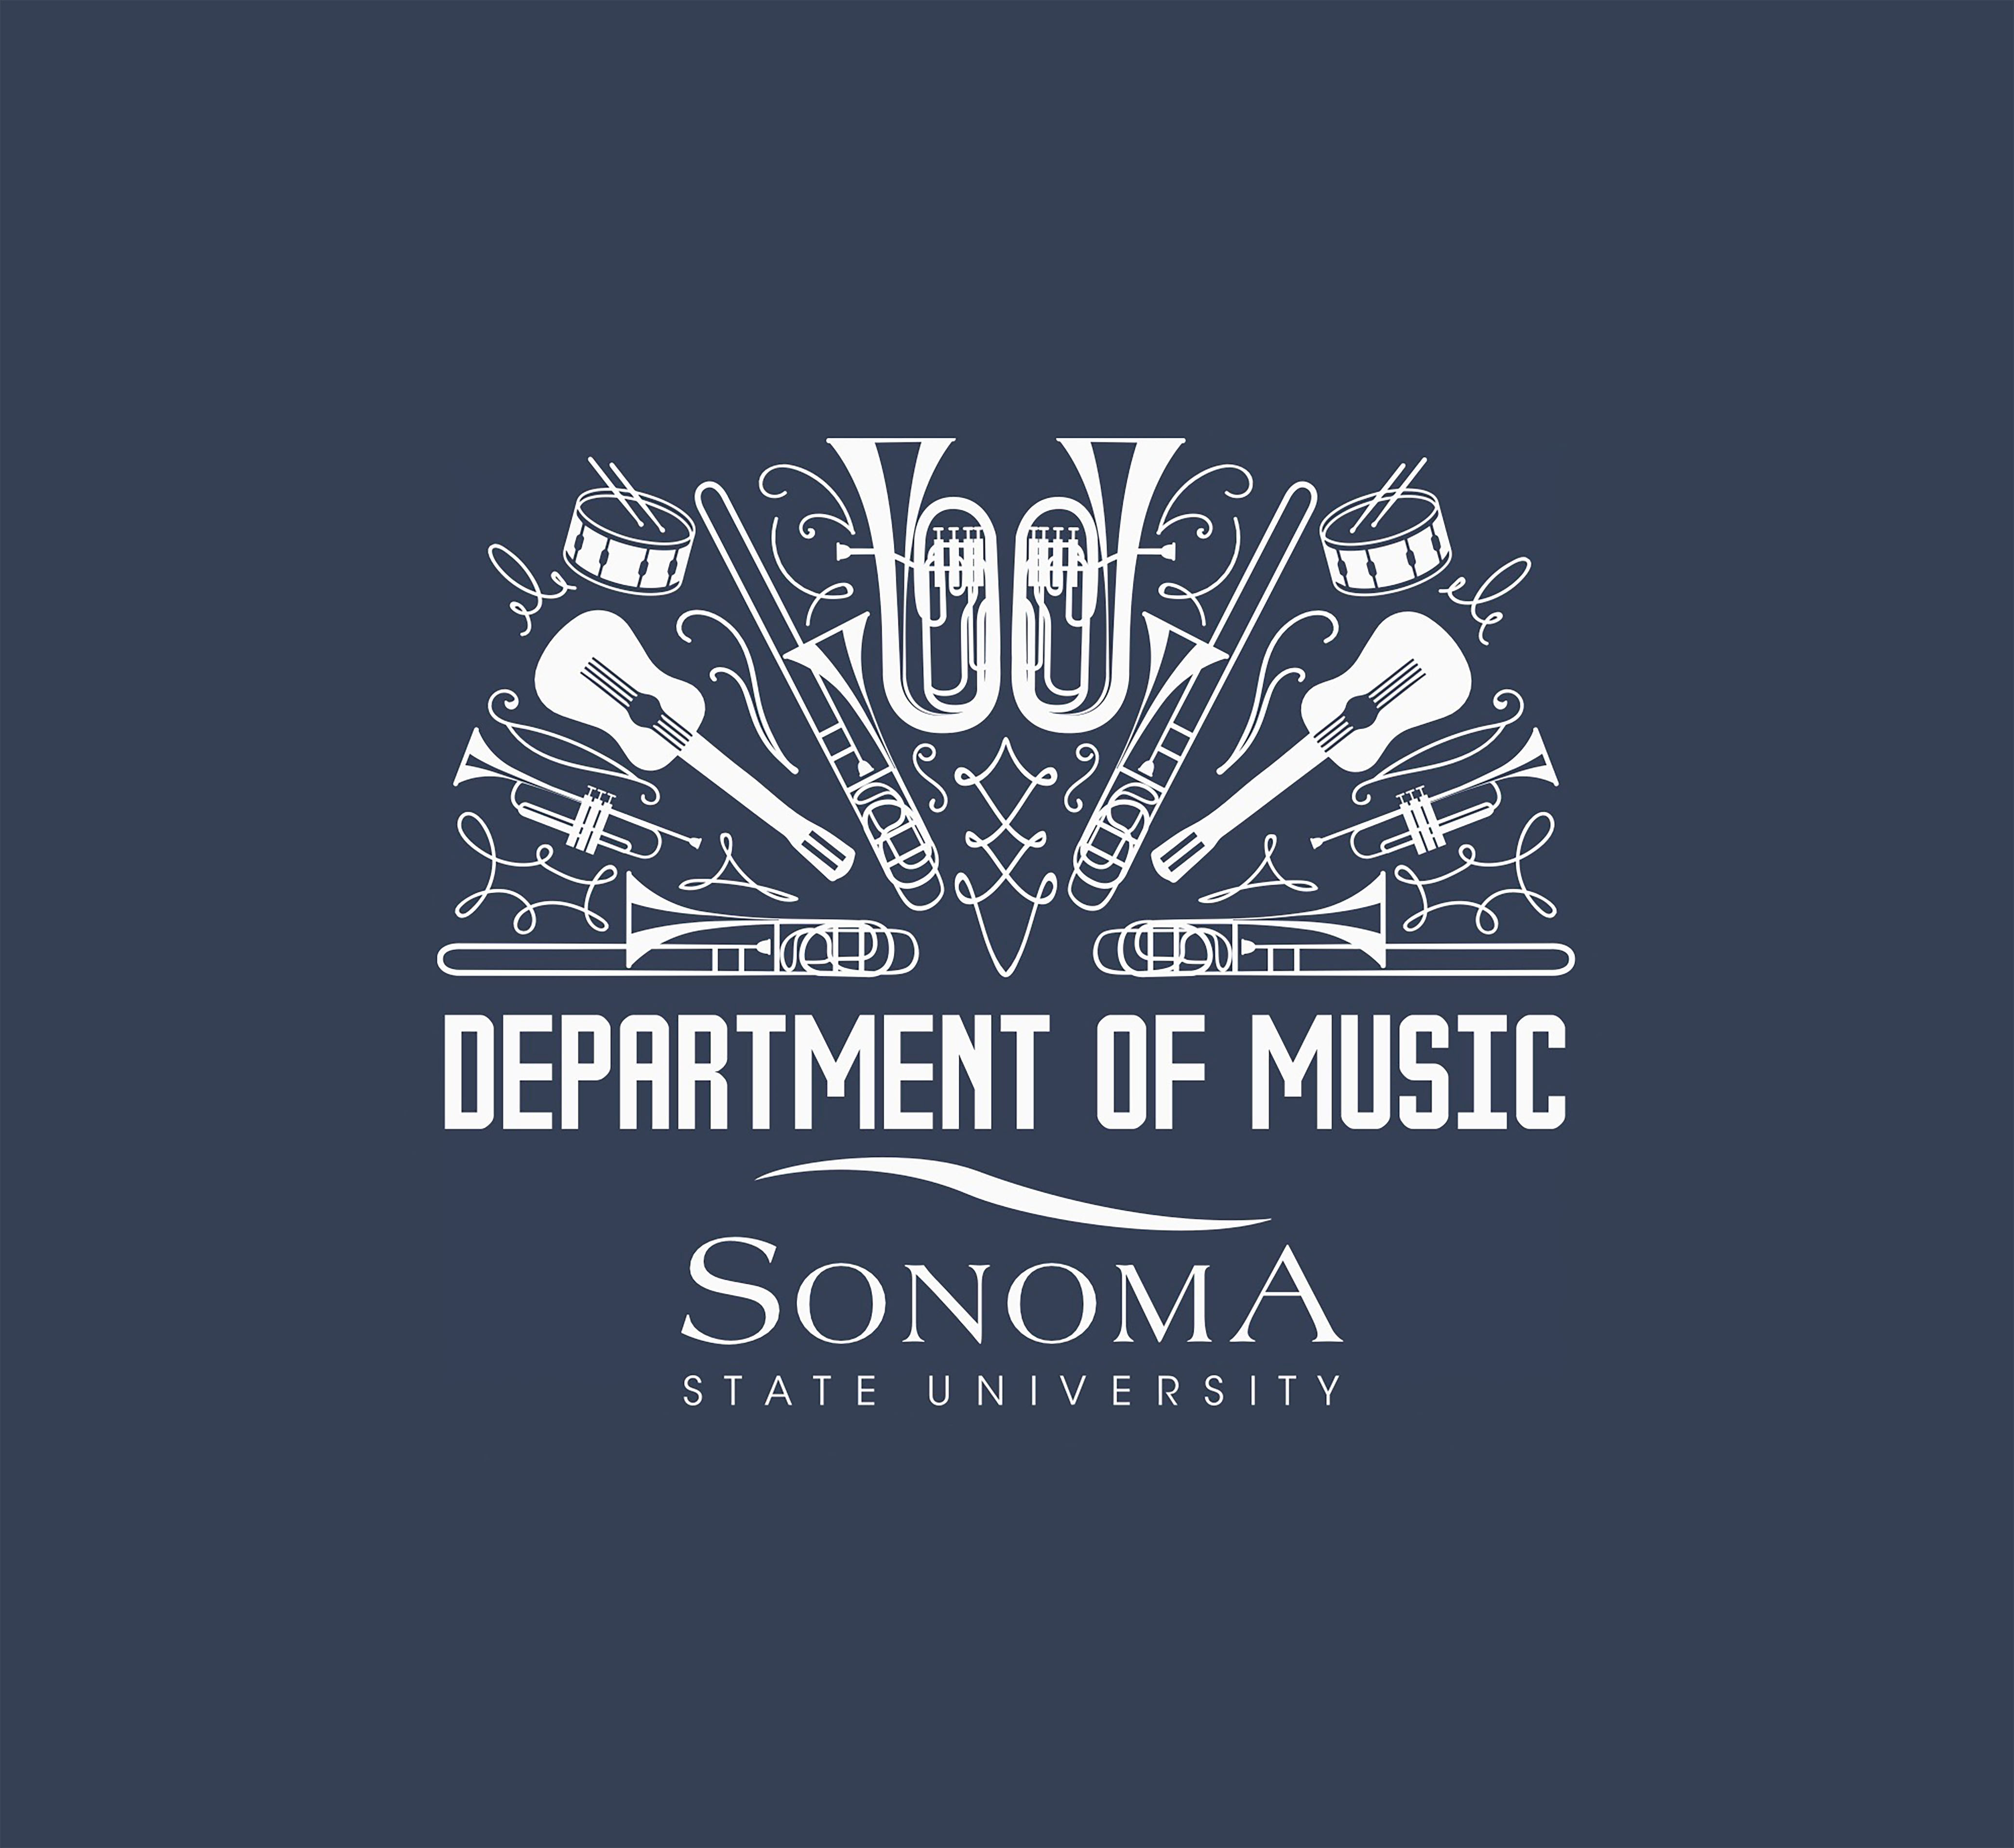 Department of Music Sonoma State University